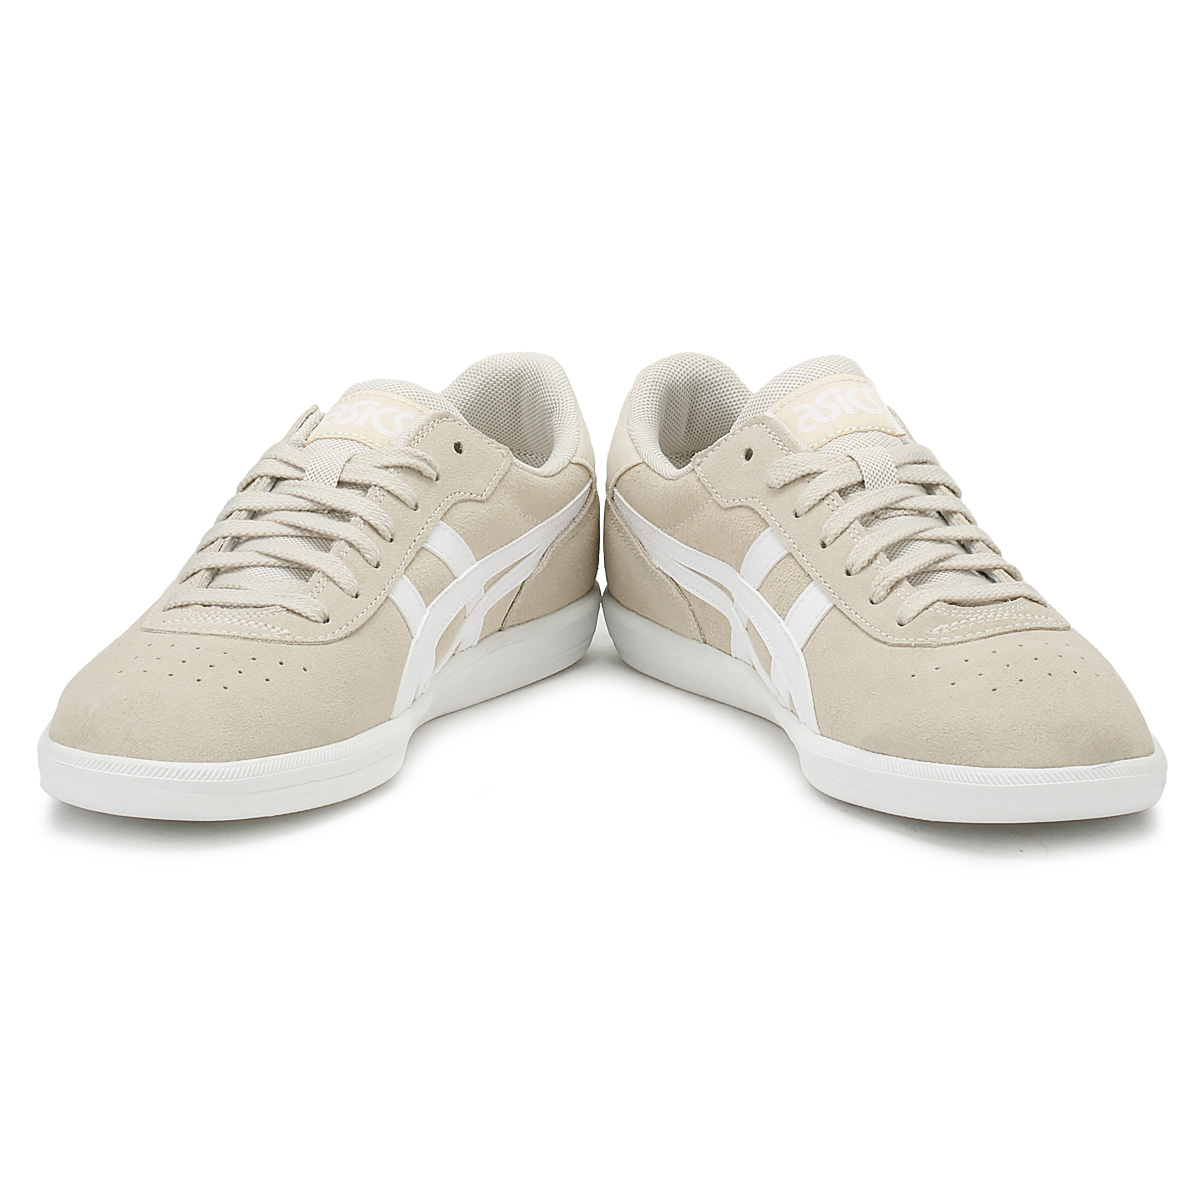 ASICS  Uomo Birch Beige Precussor Casual TRS Trainers Lace Up Casual Precussor Classic Schuhes 47ffa2